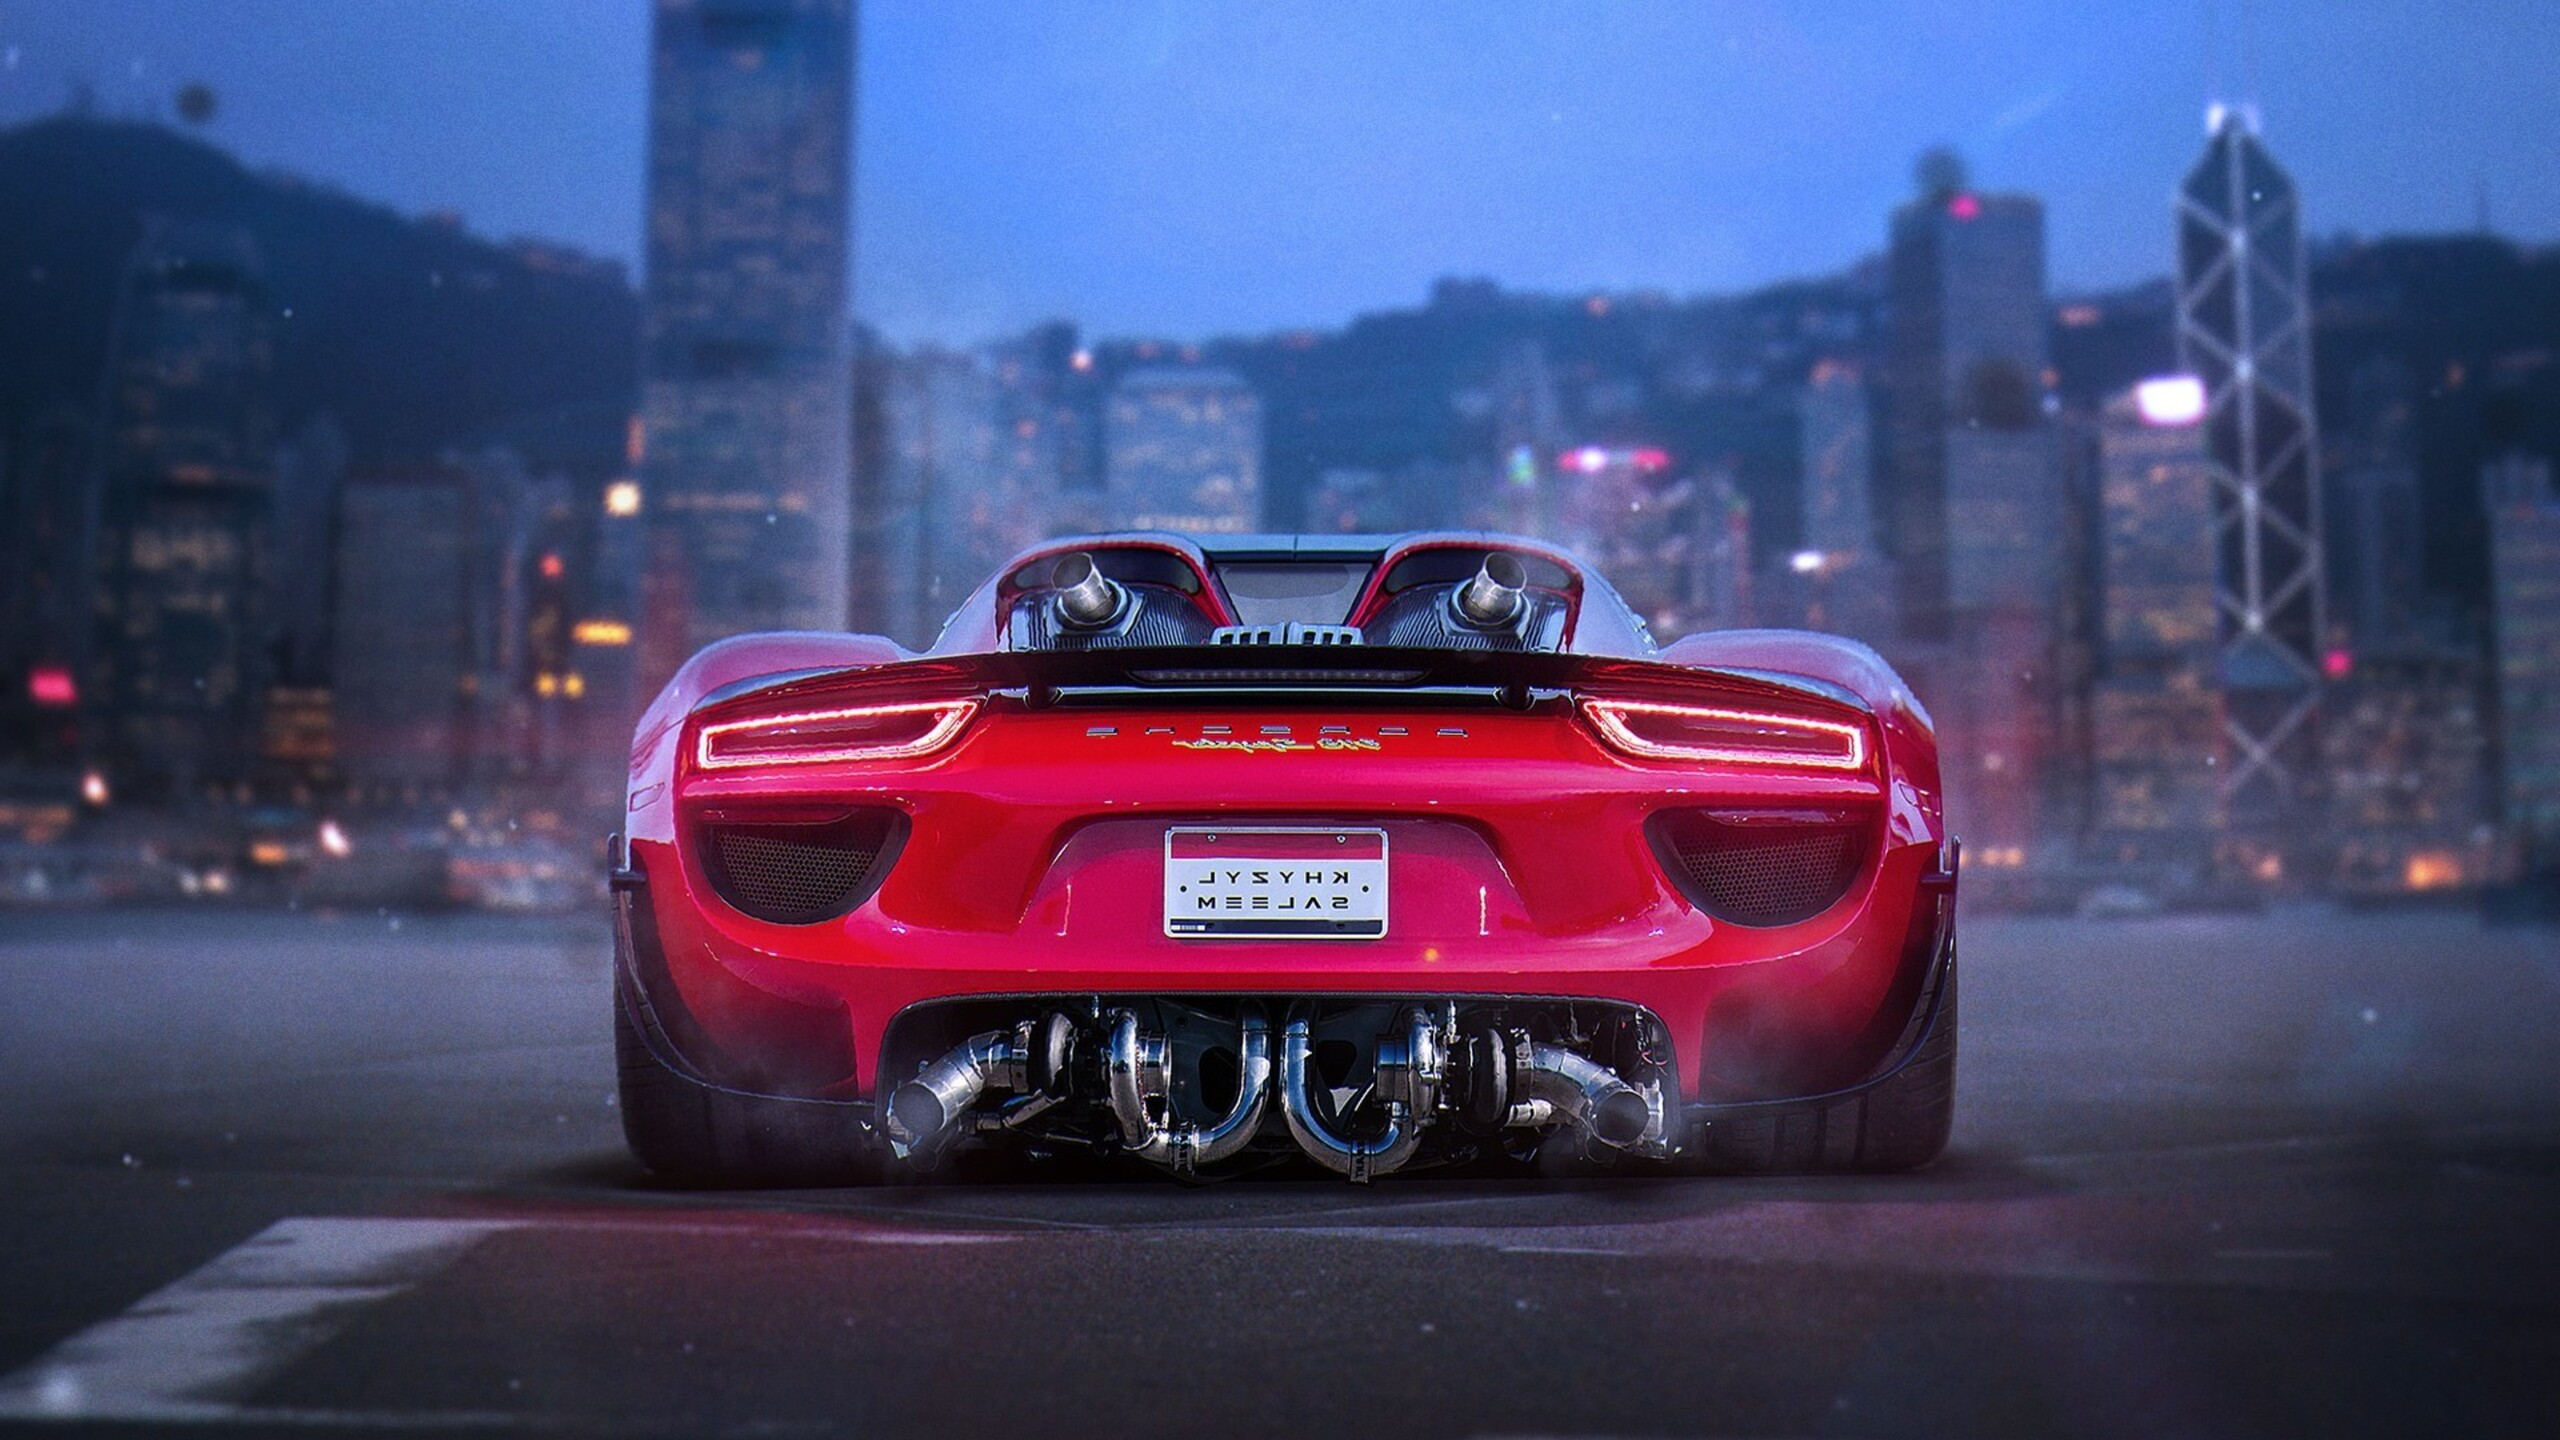 2560x1440 Porsche 918 Spyder HD 1440P Resolution HD 4k ...